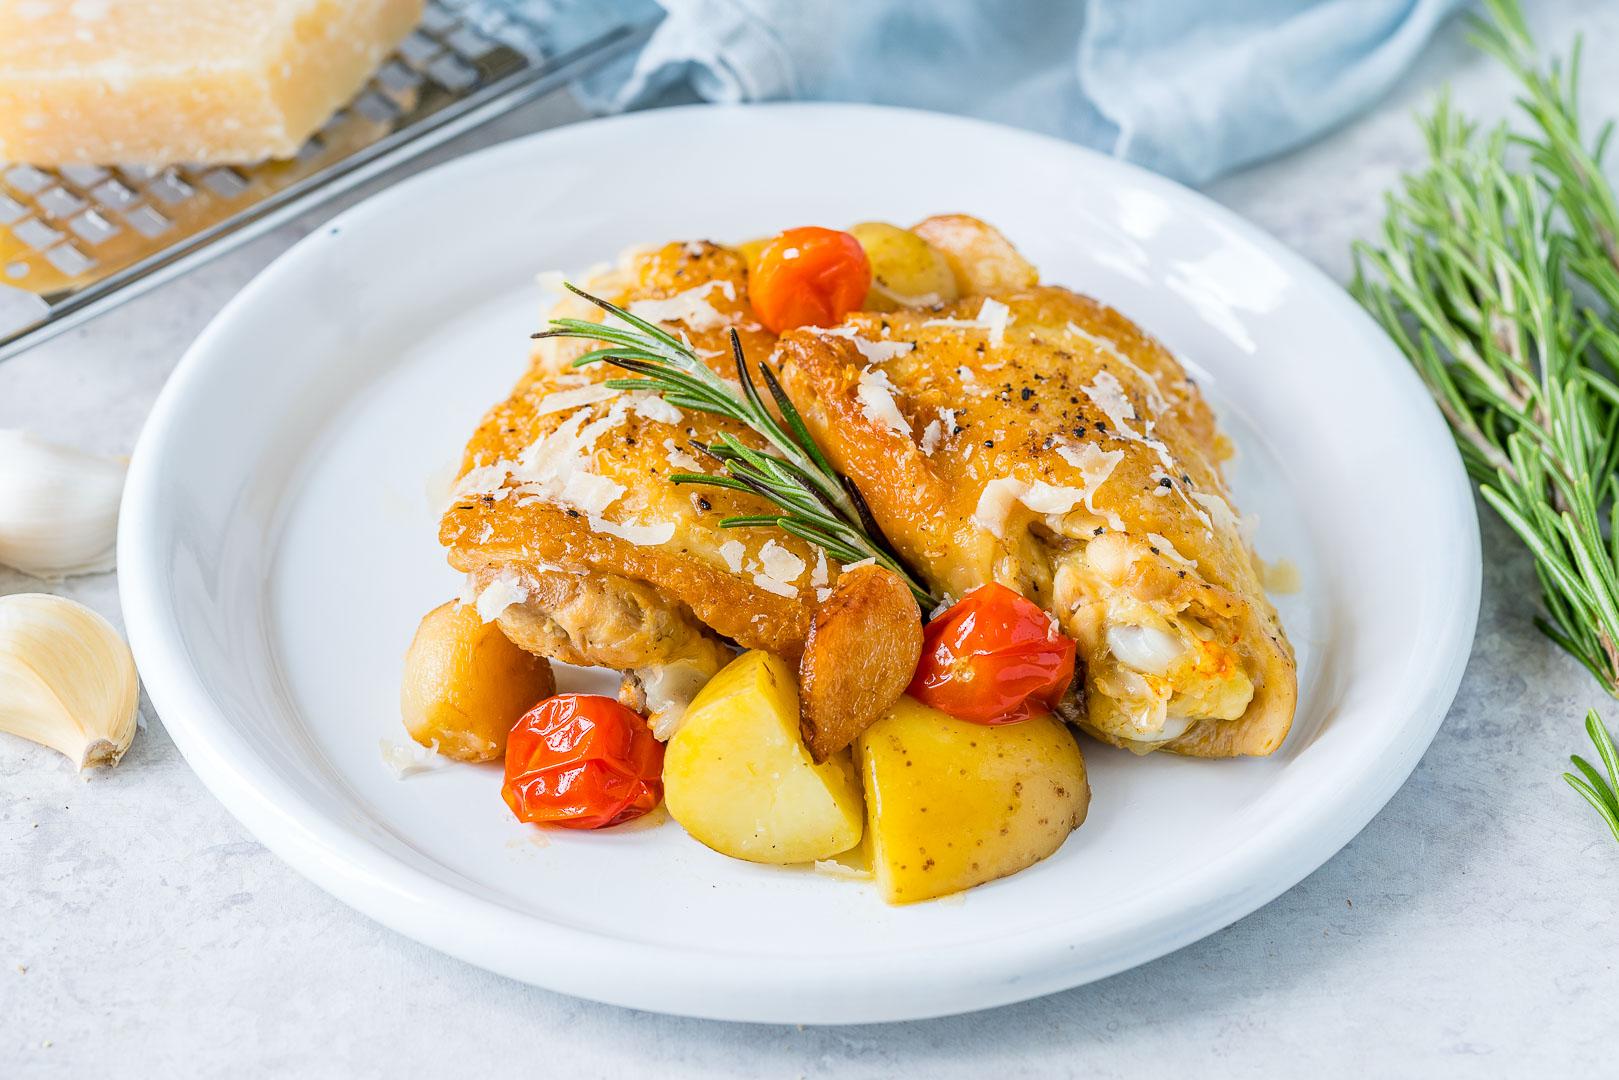 Healthy Slow Cooker Garlic Parmesan Chicken + New Potatoes